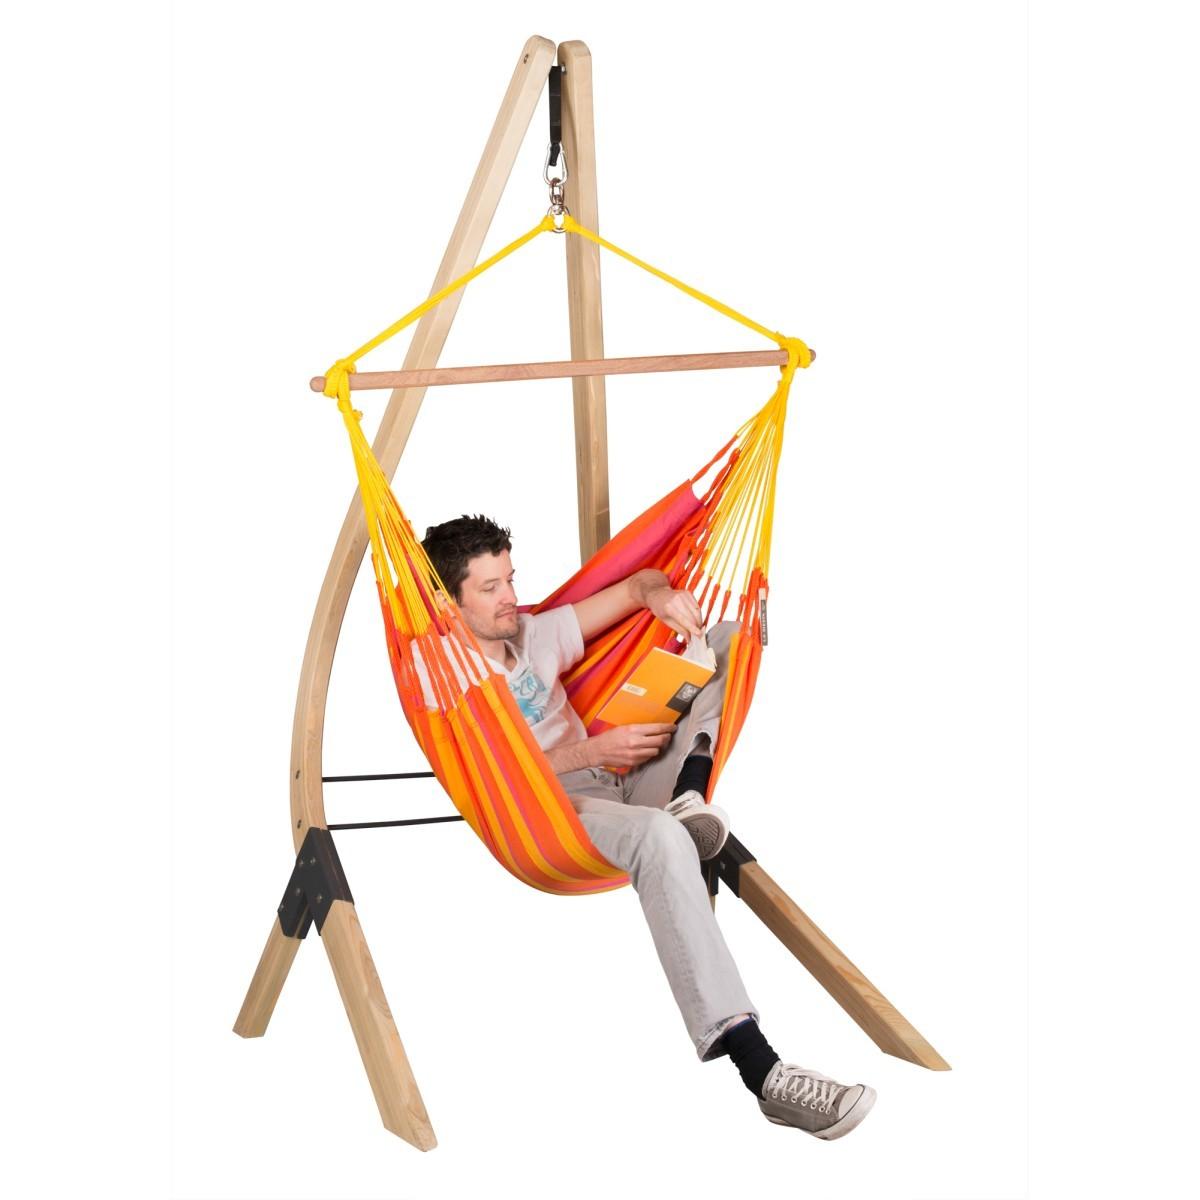 la siesta chaise hamac basic sonrisa mandarine support en bois vela. Black Bedroom Furniture Sets. Home Design Ideas